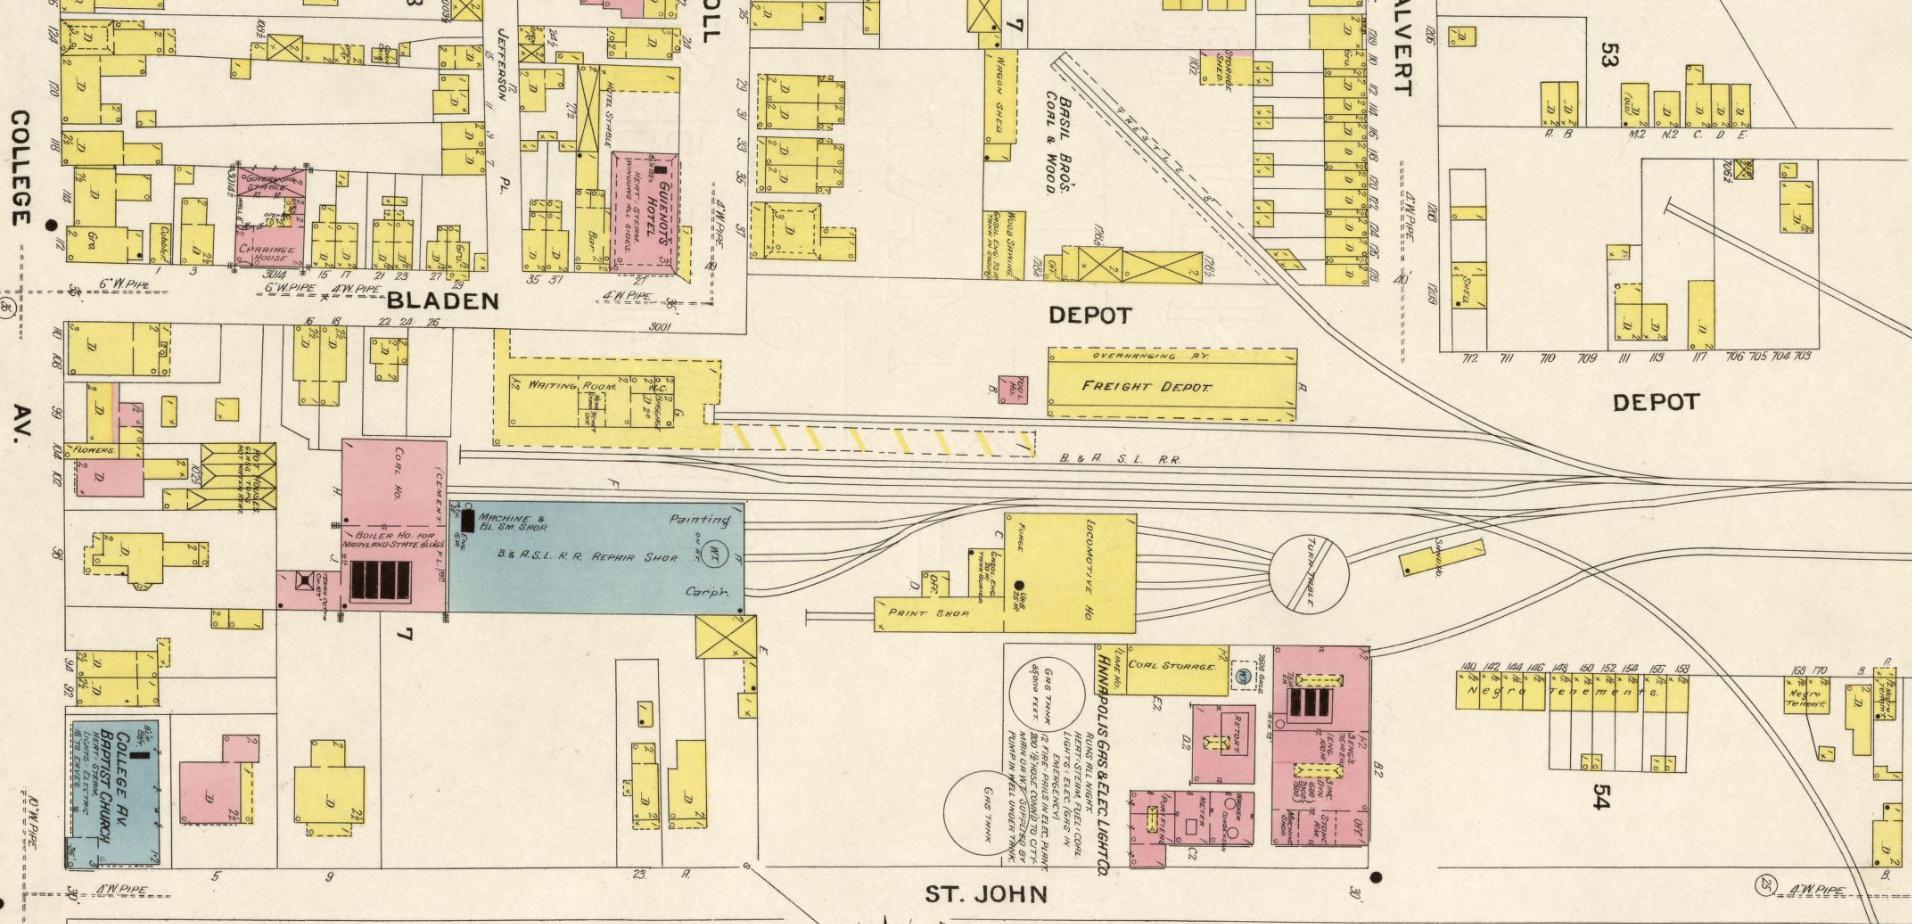 Baltimore & Annapolis Railroad, Bladen Street Station. Annapolis, Maryland Date: 1908. Source: Sanborn Fire Insurance Maps.